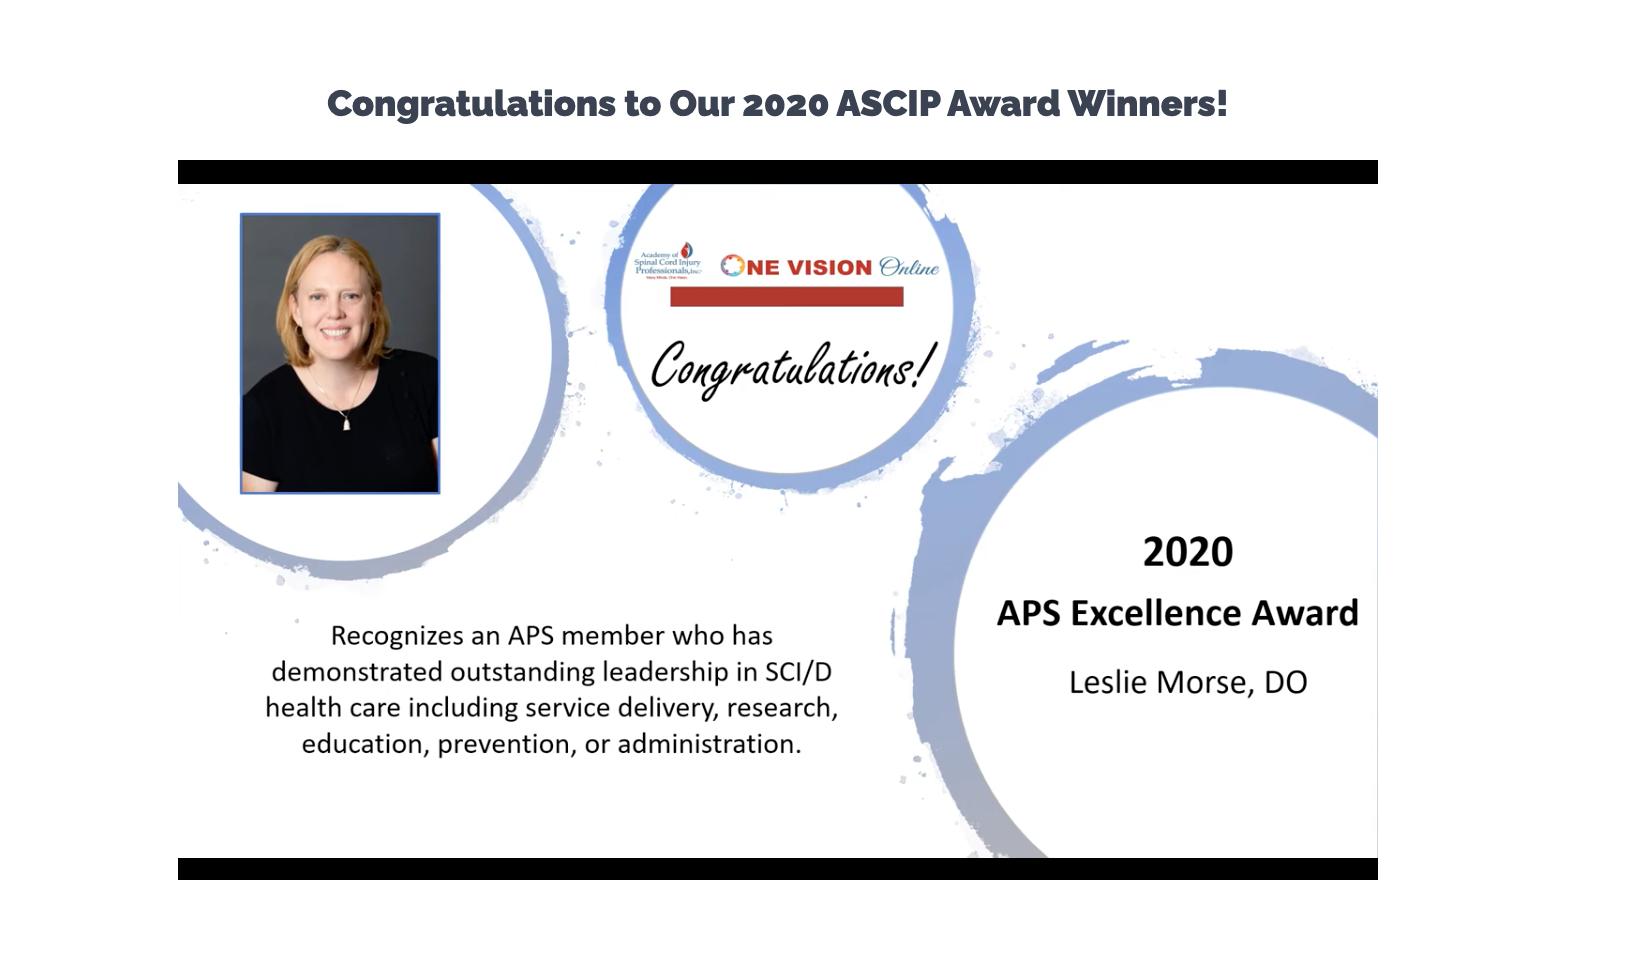 Dr. Leslie Morse's Recognition for the 2020 APS Excellence Award